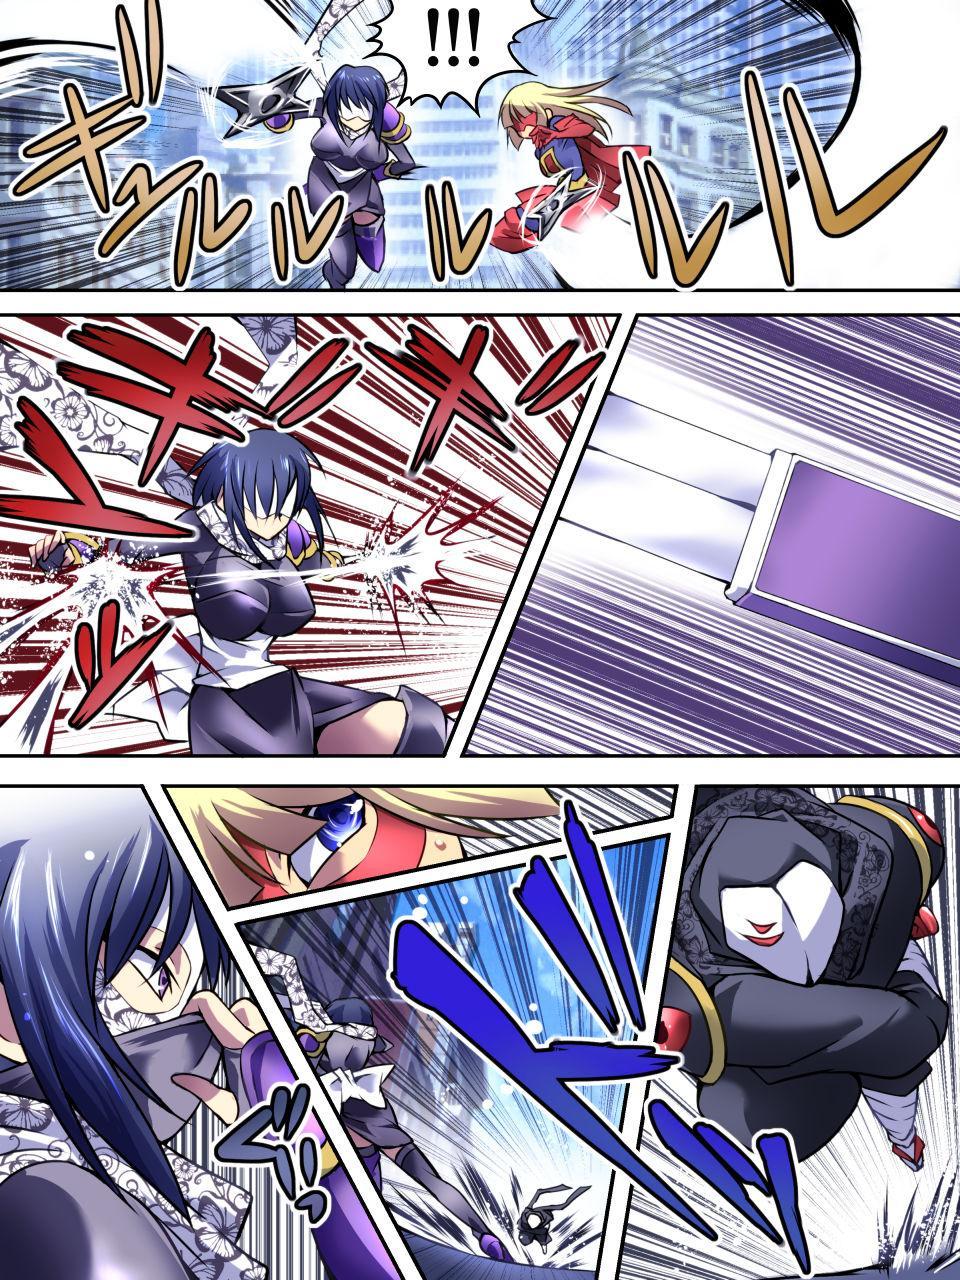 [Atelier Hachifukuan] Superheroine Yuukai Ryoujoku IV - Superheroine in Distress - Kunoichi Suzushiro [English] [Harasho Project] 10